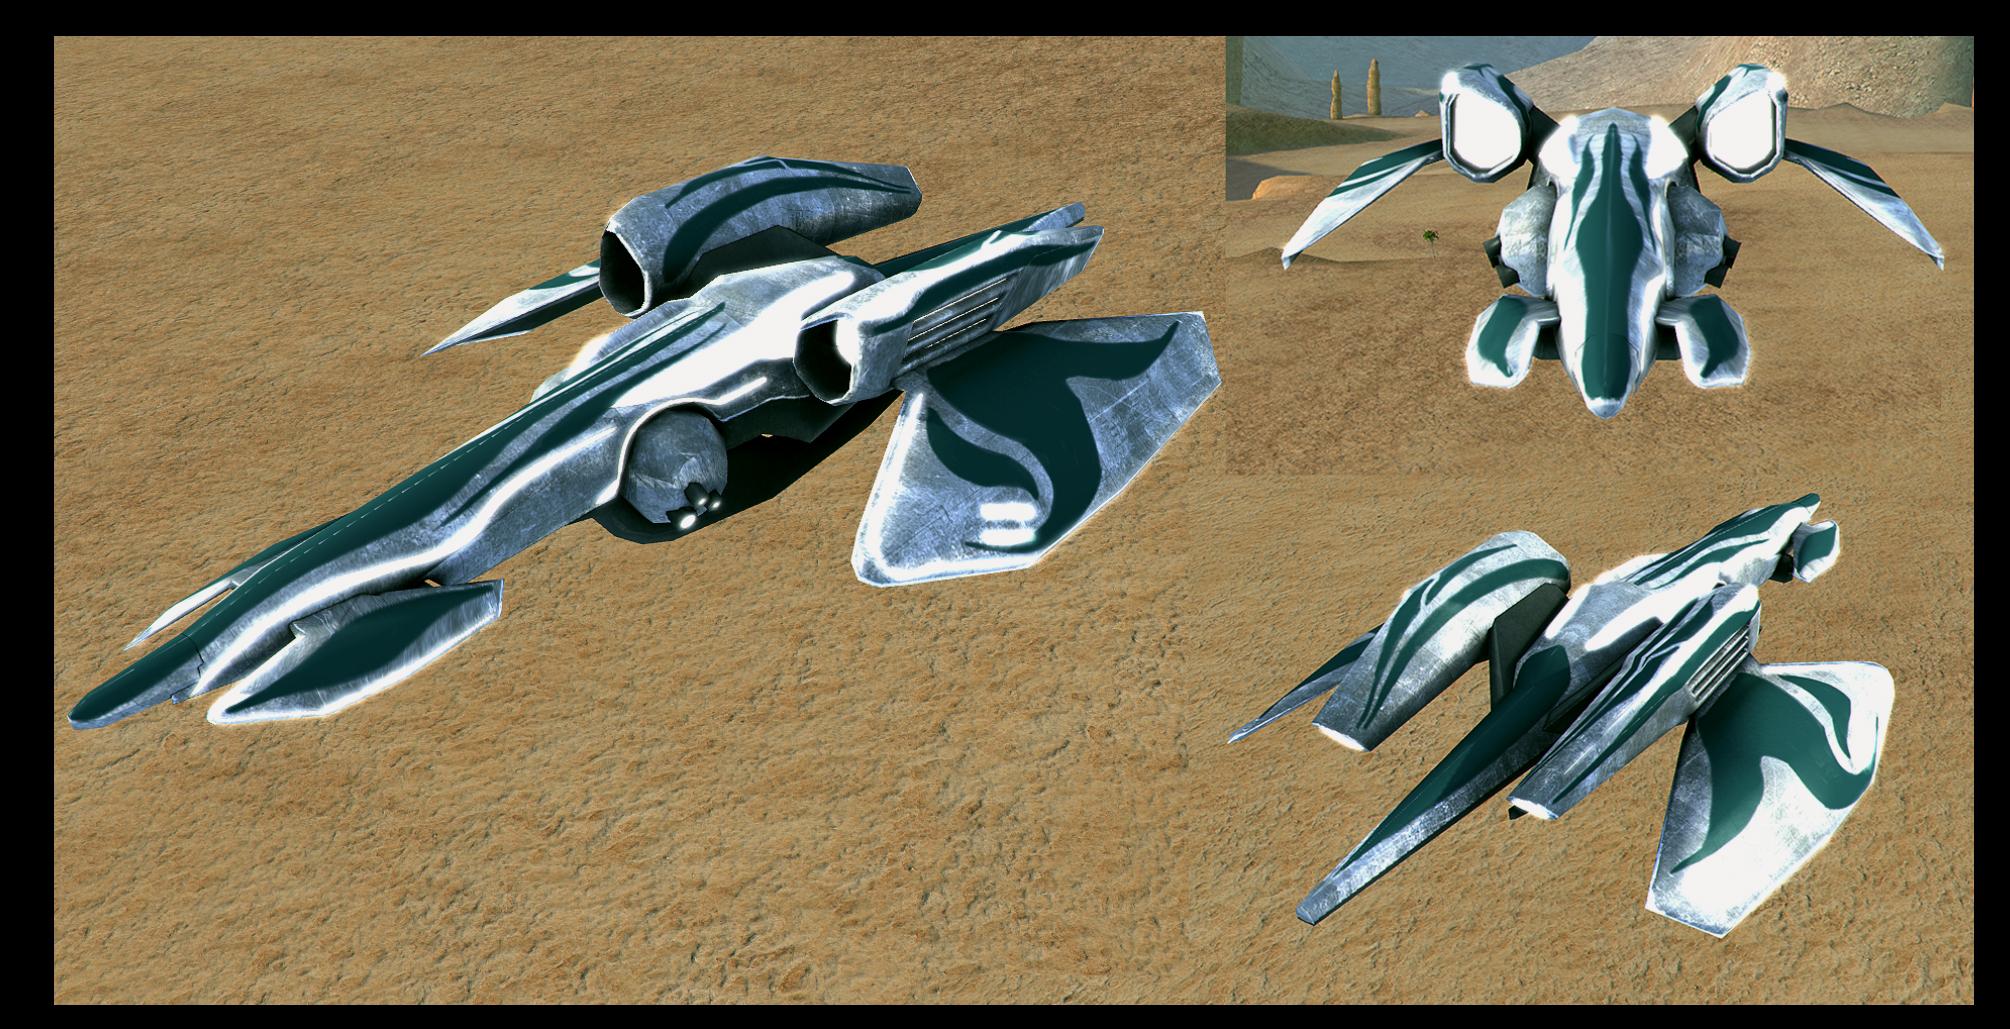 geophysical masint, sr-71 blackbird, rc kite plane, rc plane with camera, twin motor rc plane, fastest rc plane, unmanned aerial vehicle, rc cargo plane, heterogeneous aerial reconnaissance team, rc war plane, hubsan fpv plane, rc foam plane plans, delta ray rc plane, funny rc plane, rc crop duster planes, predator drone rc plane, x-wing rc plane, rq-4 global hawk, mq-9 reaper, rc planes hospital, surveillance art, rq-1 predator, c-12 huron, p-3 orion, rc model planes, rc plane transmitter, combat zones that see, aerial reconnaissance, computer surveillance, parts of a plane, fpv rc plane, boeing rc-135, electric drone model plane, rc plane remote controller, on spy rc plane